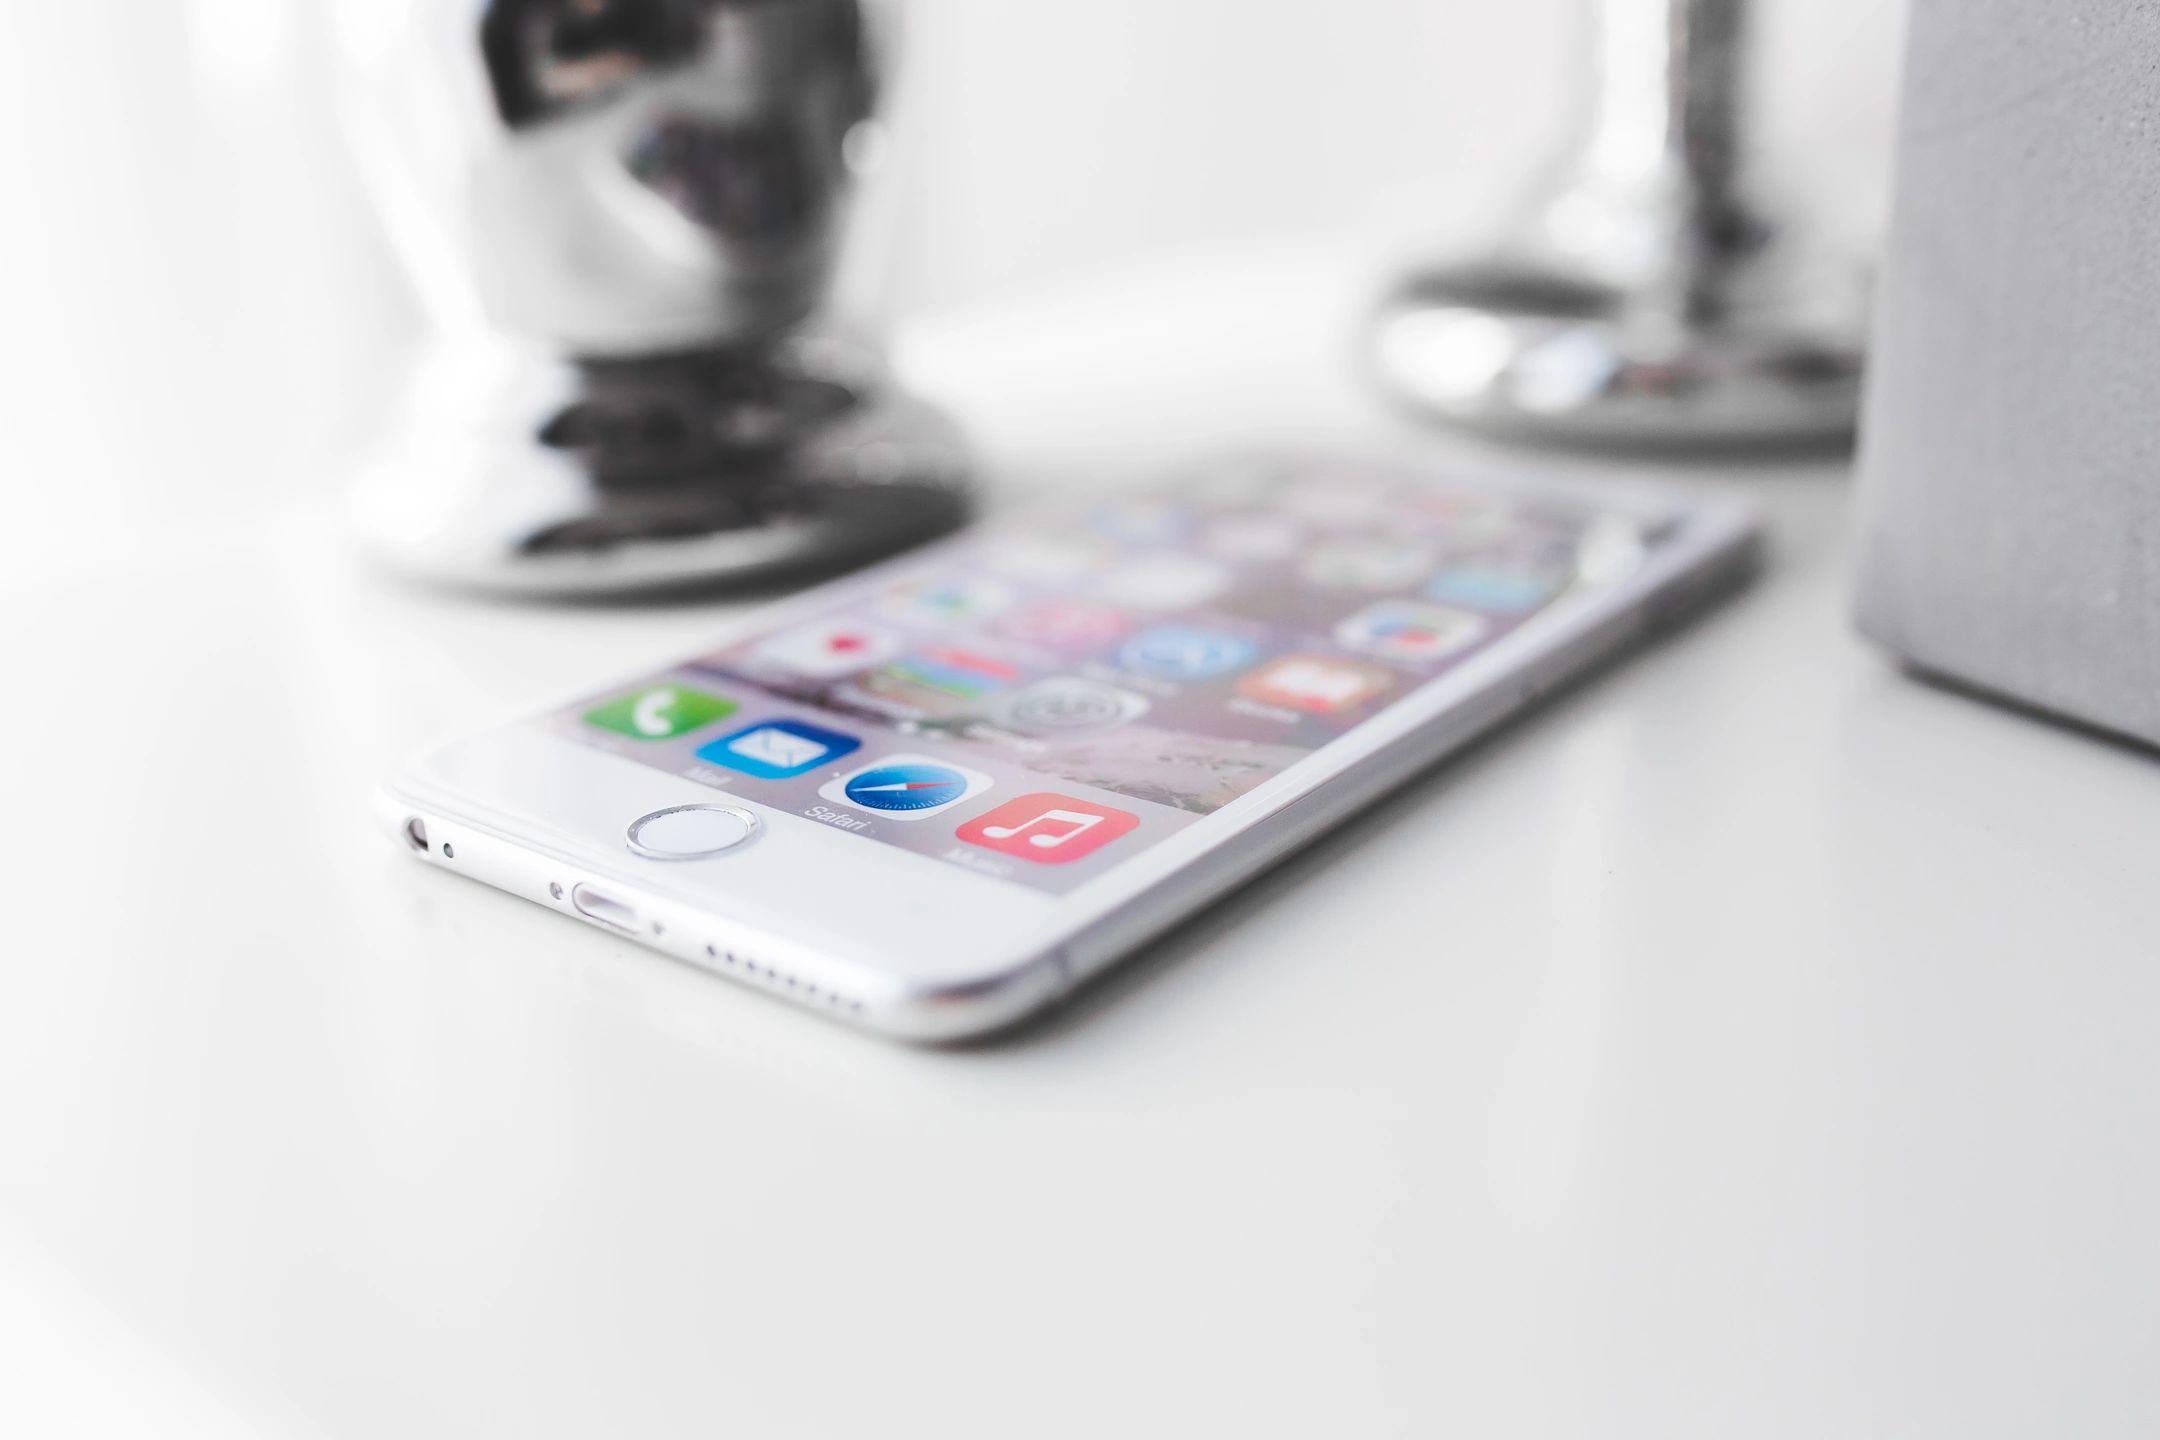 Sound Level Measuring using smartphones? Think twice